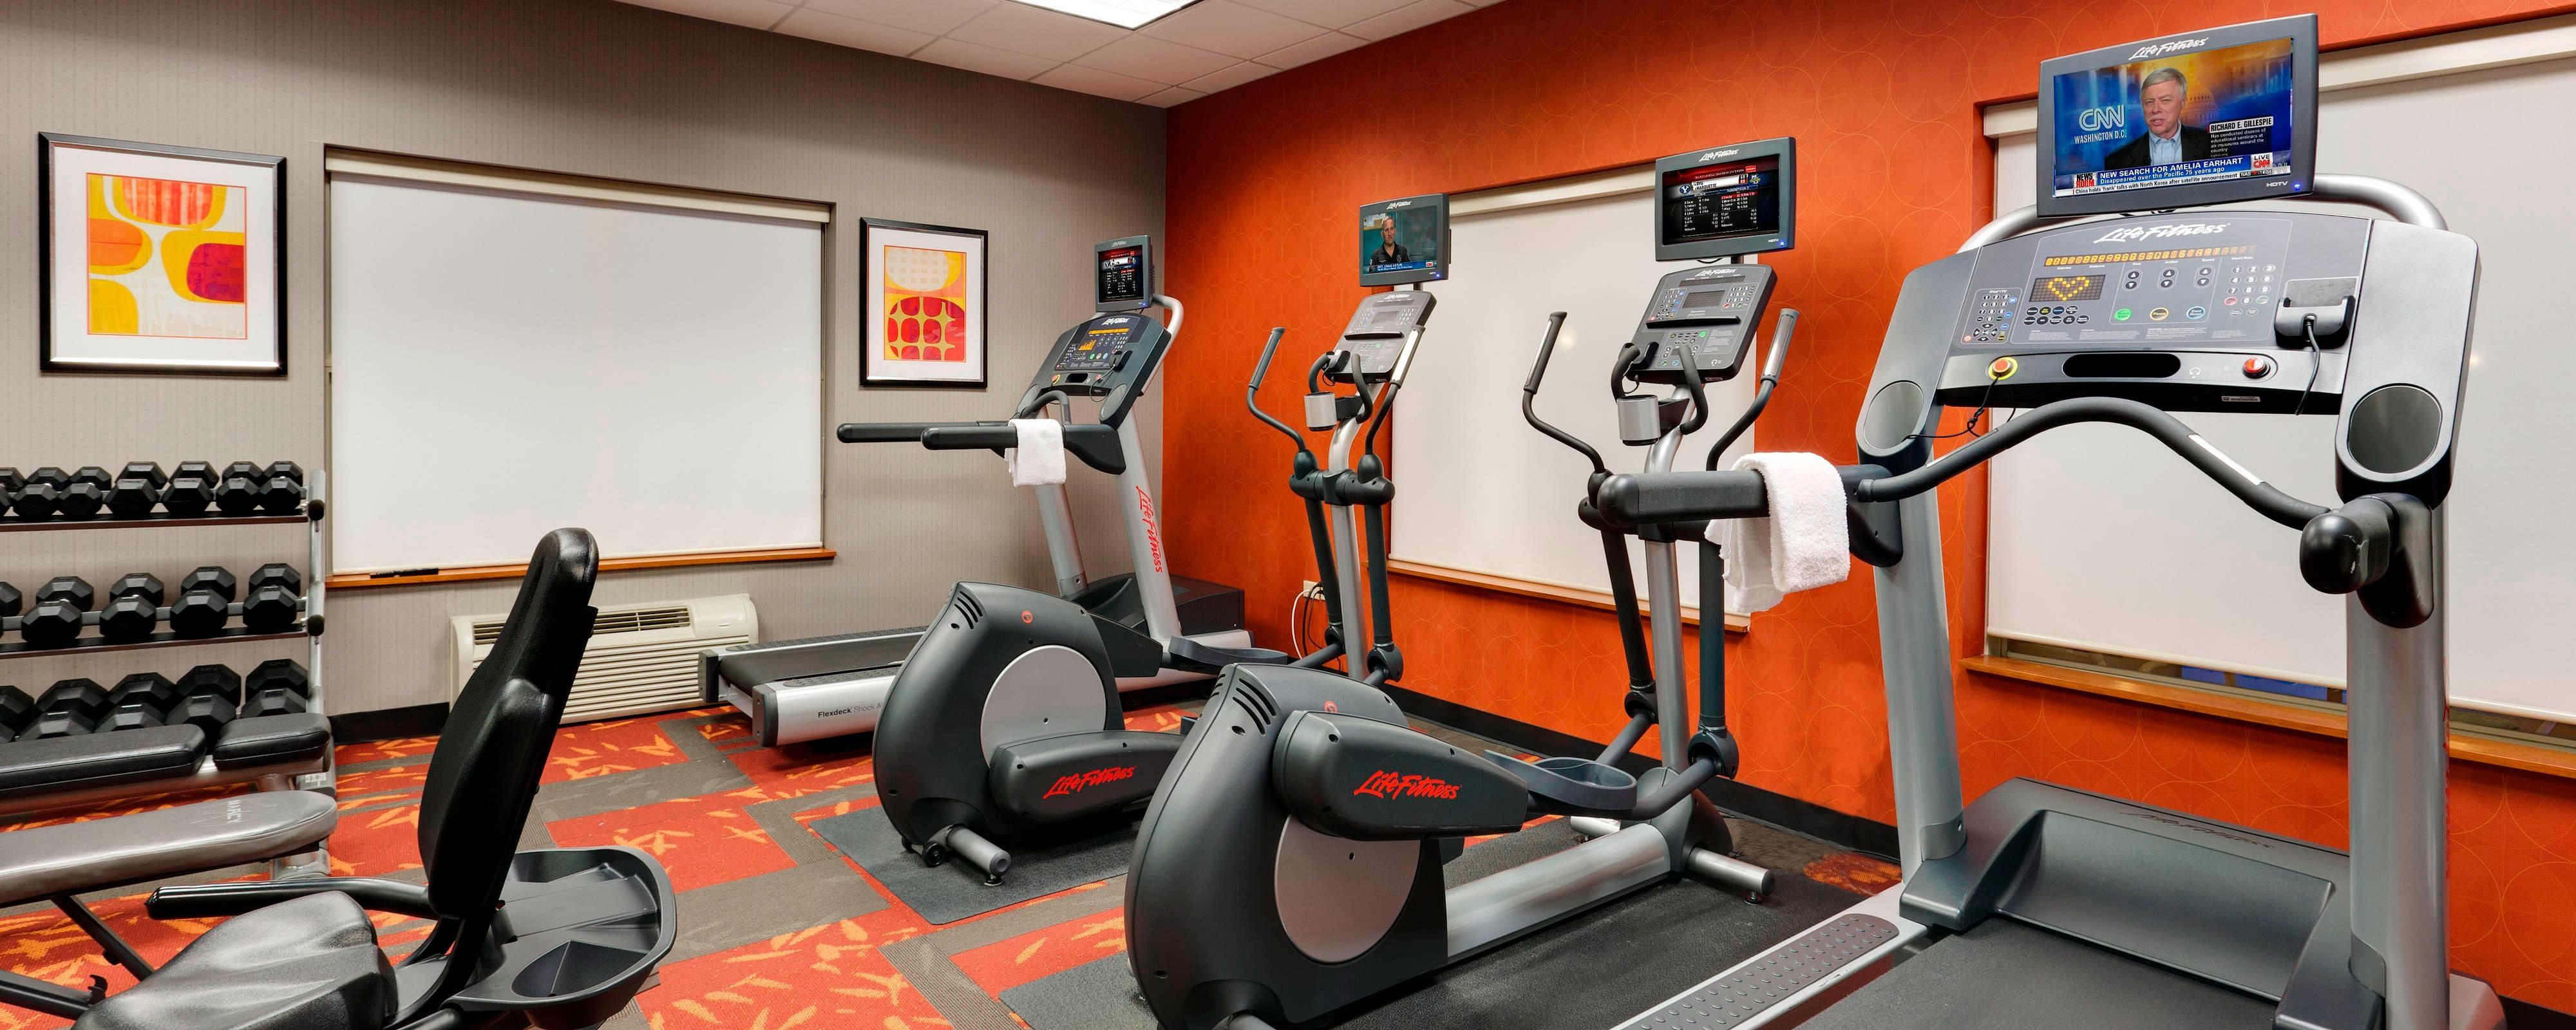 Naperville Hotel Gym